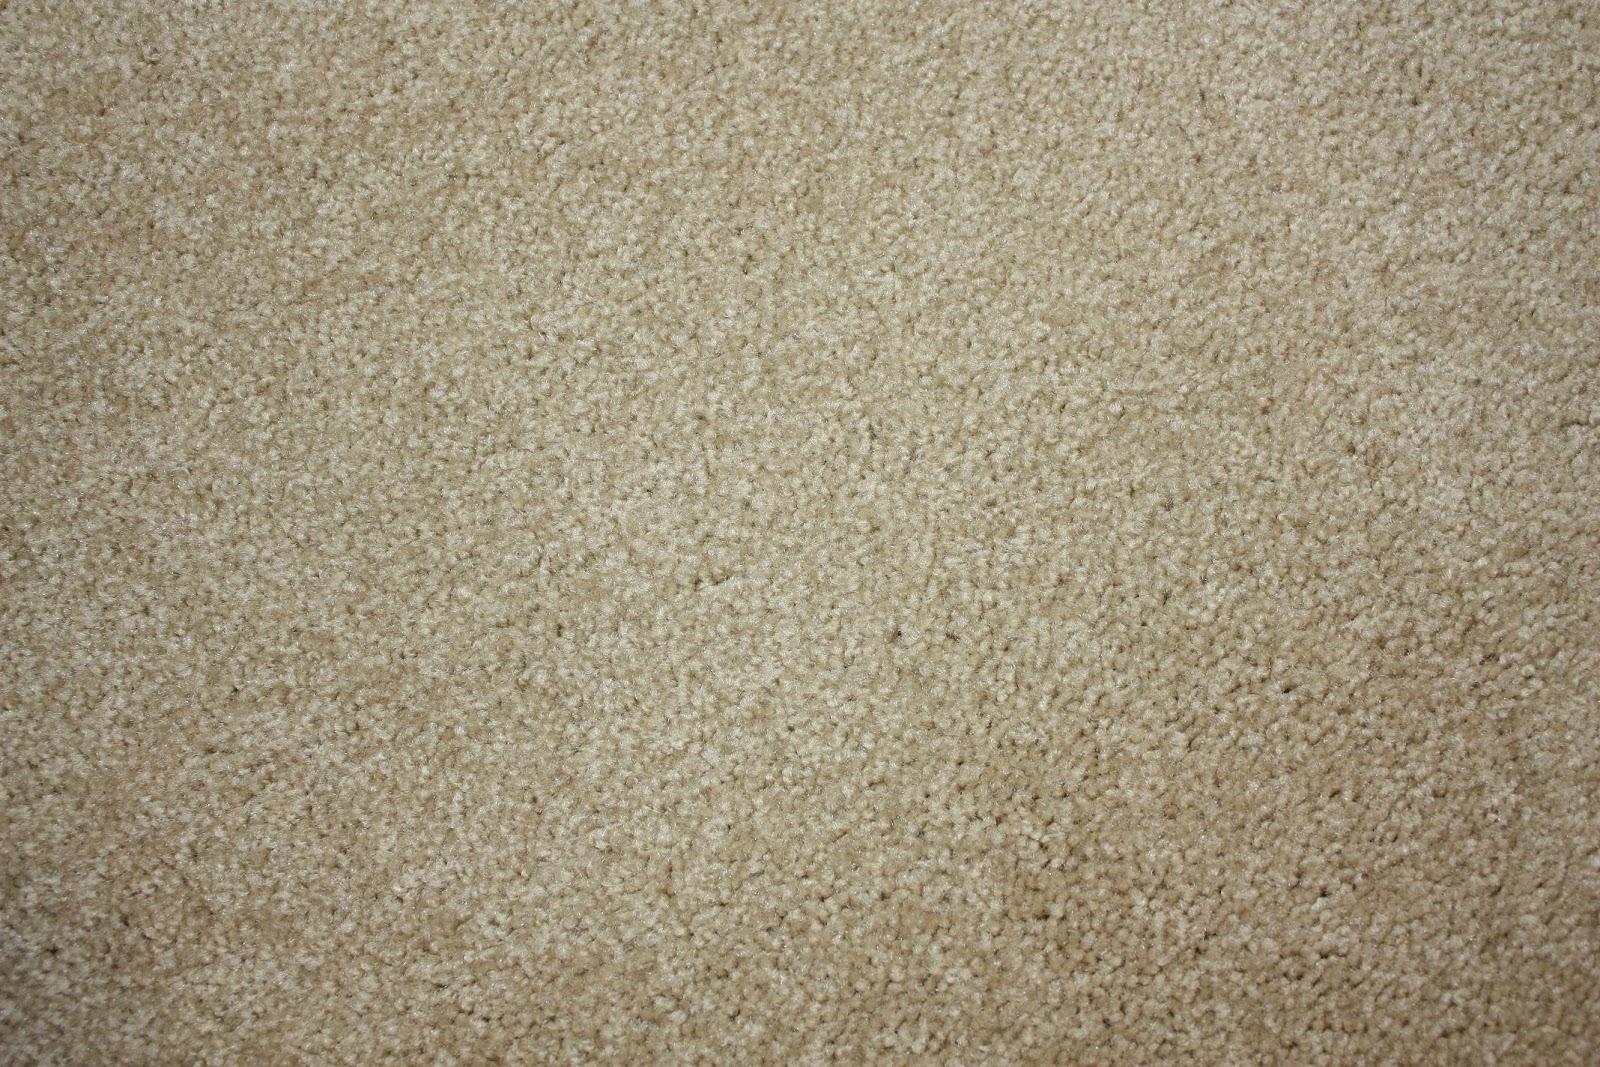 heidi schatze: Operation Listing: Carpet